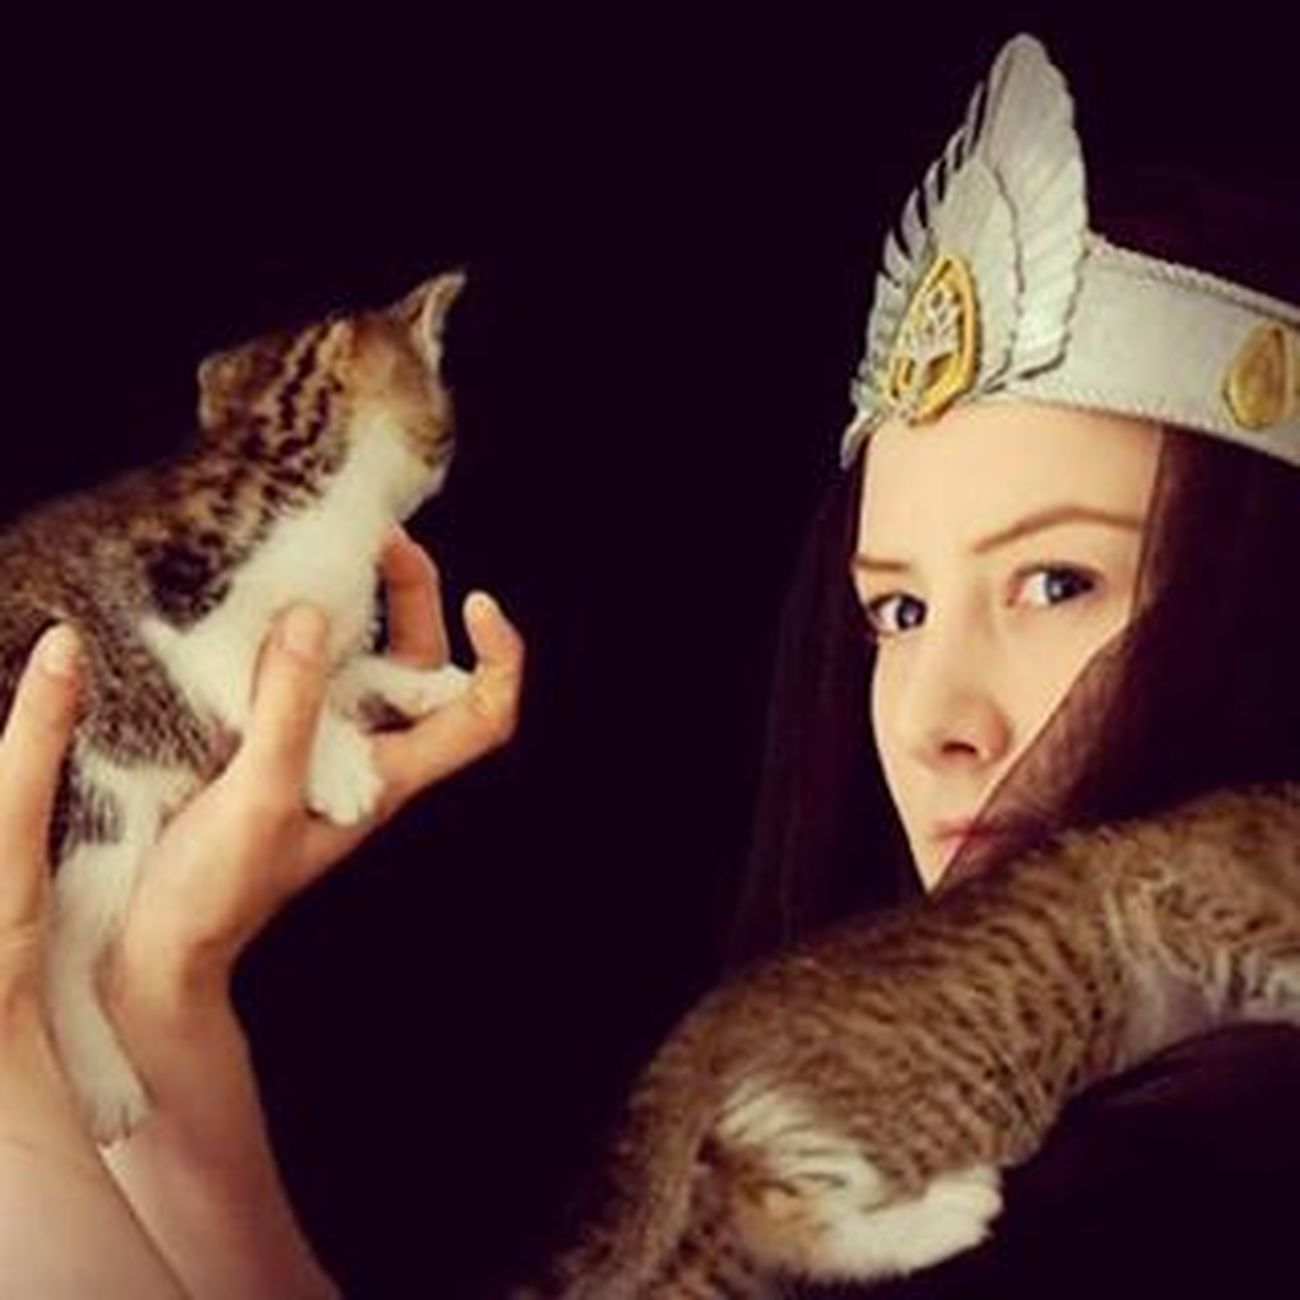 Beruthiel TarannonFalastur Gondor Queenofgondor Cat Catqueen Umbar Darknumenorean Sauron Melkor Catqueencosplay Kitten Angryqueen Numenor Beruthielcosplay LOTR Hobbit Silmarillion MiddleEarth Tolkien Middleearthcosplay Darklady Cosplay Cosplayer Womanofmiddleearth